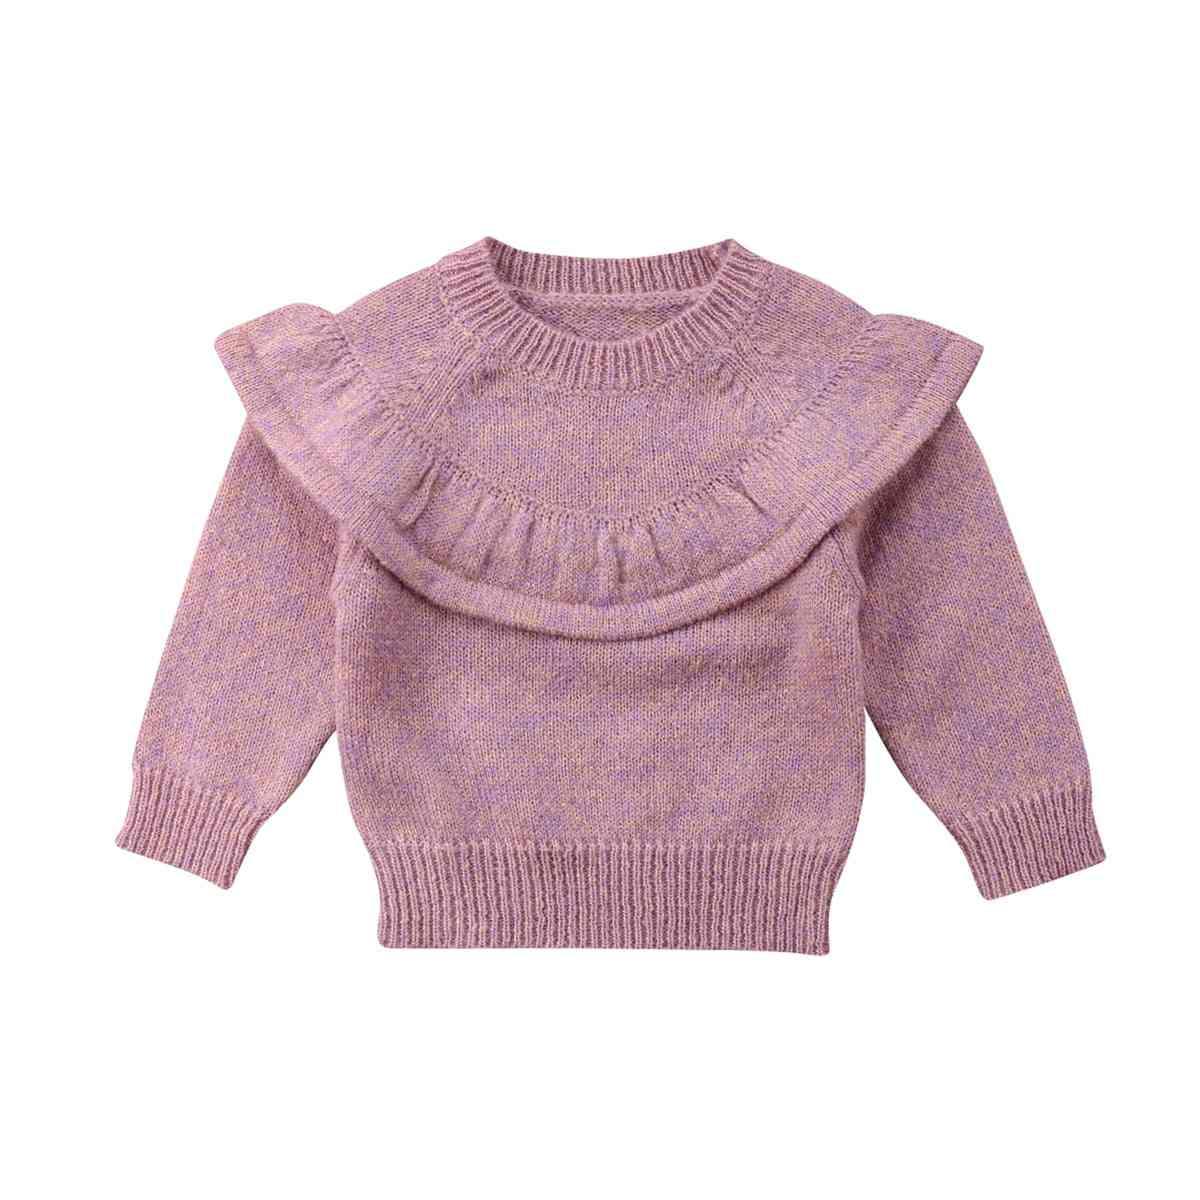 Autumn Winter Newborn Baby Girl Tops Ruffle Knitted Warm Sweater